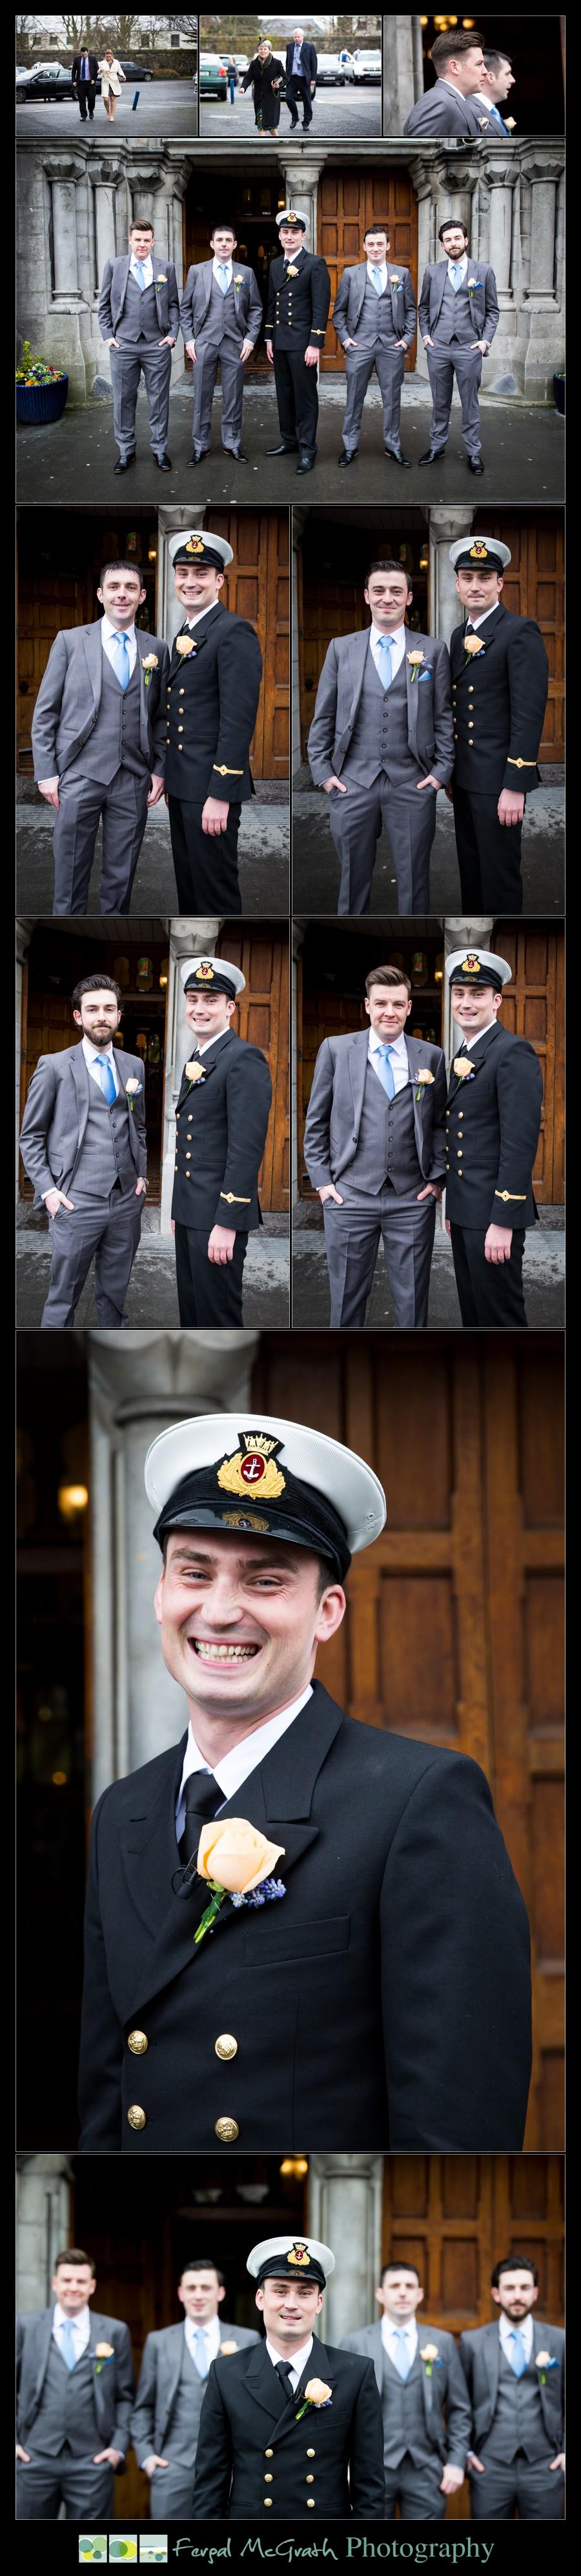 Castle Dargan Hotel Wedding Jamie and Andrew groom and his groomsmen